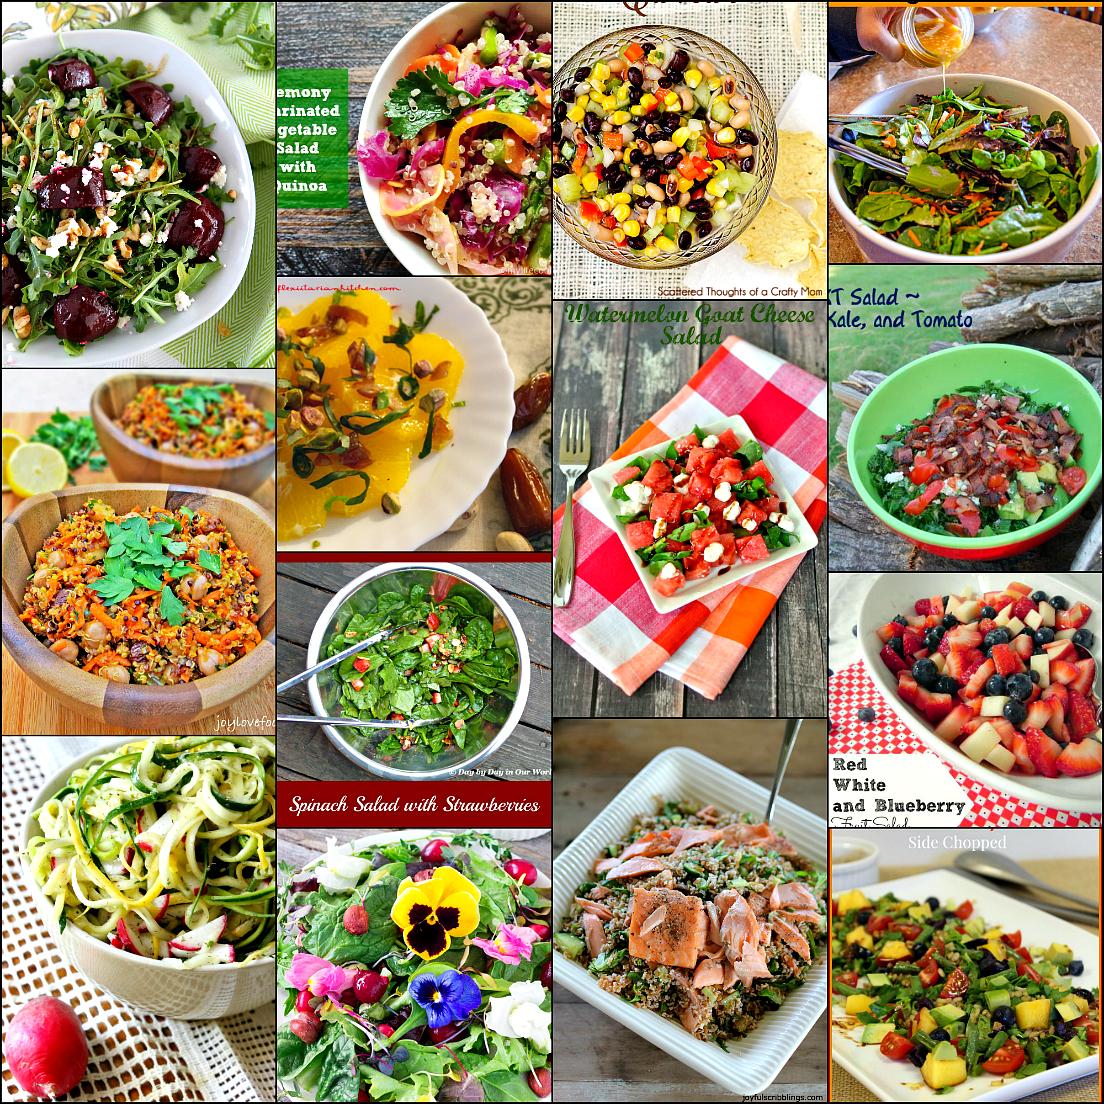 Light tasty summer salads